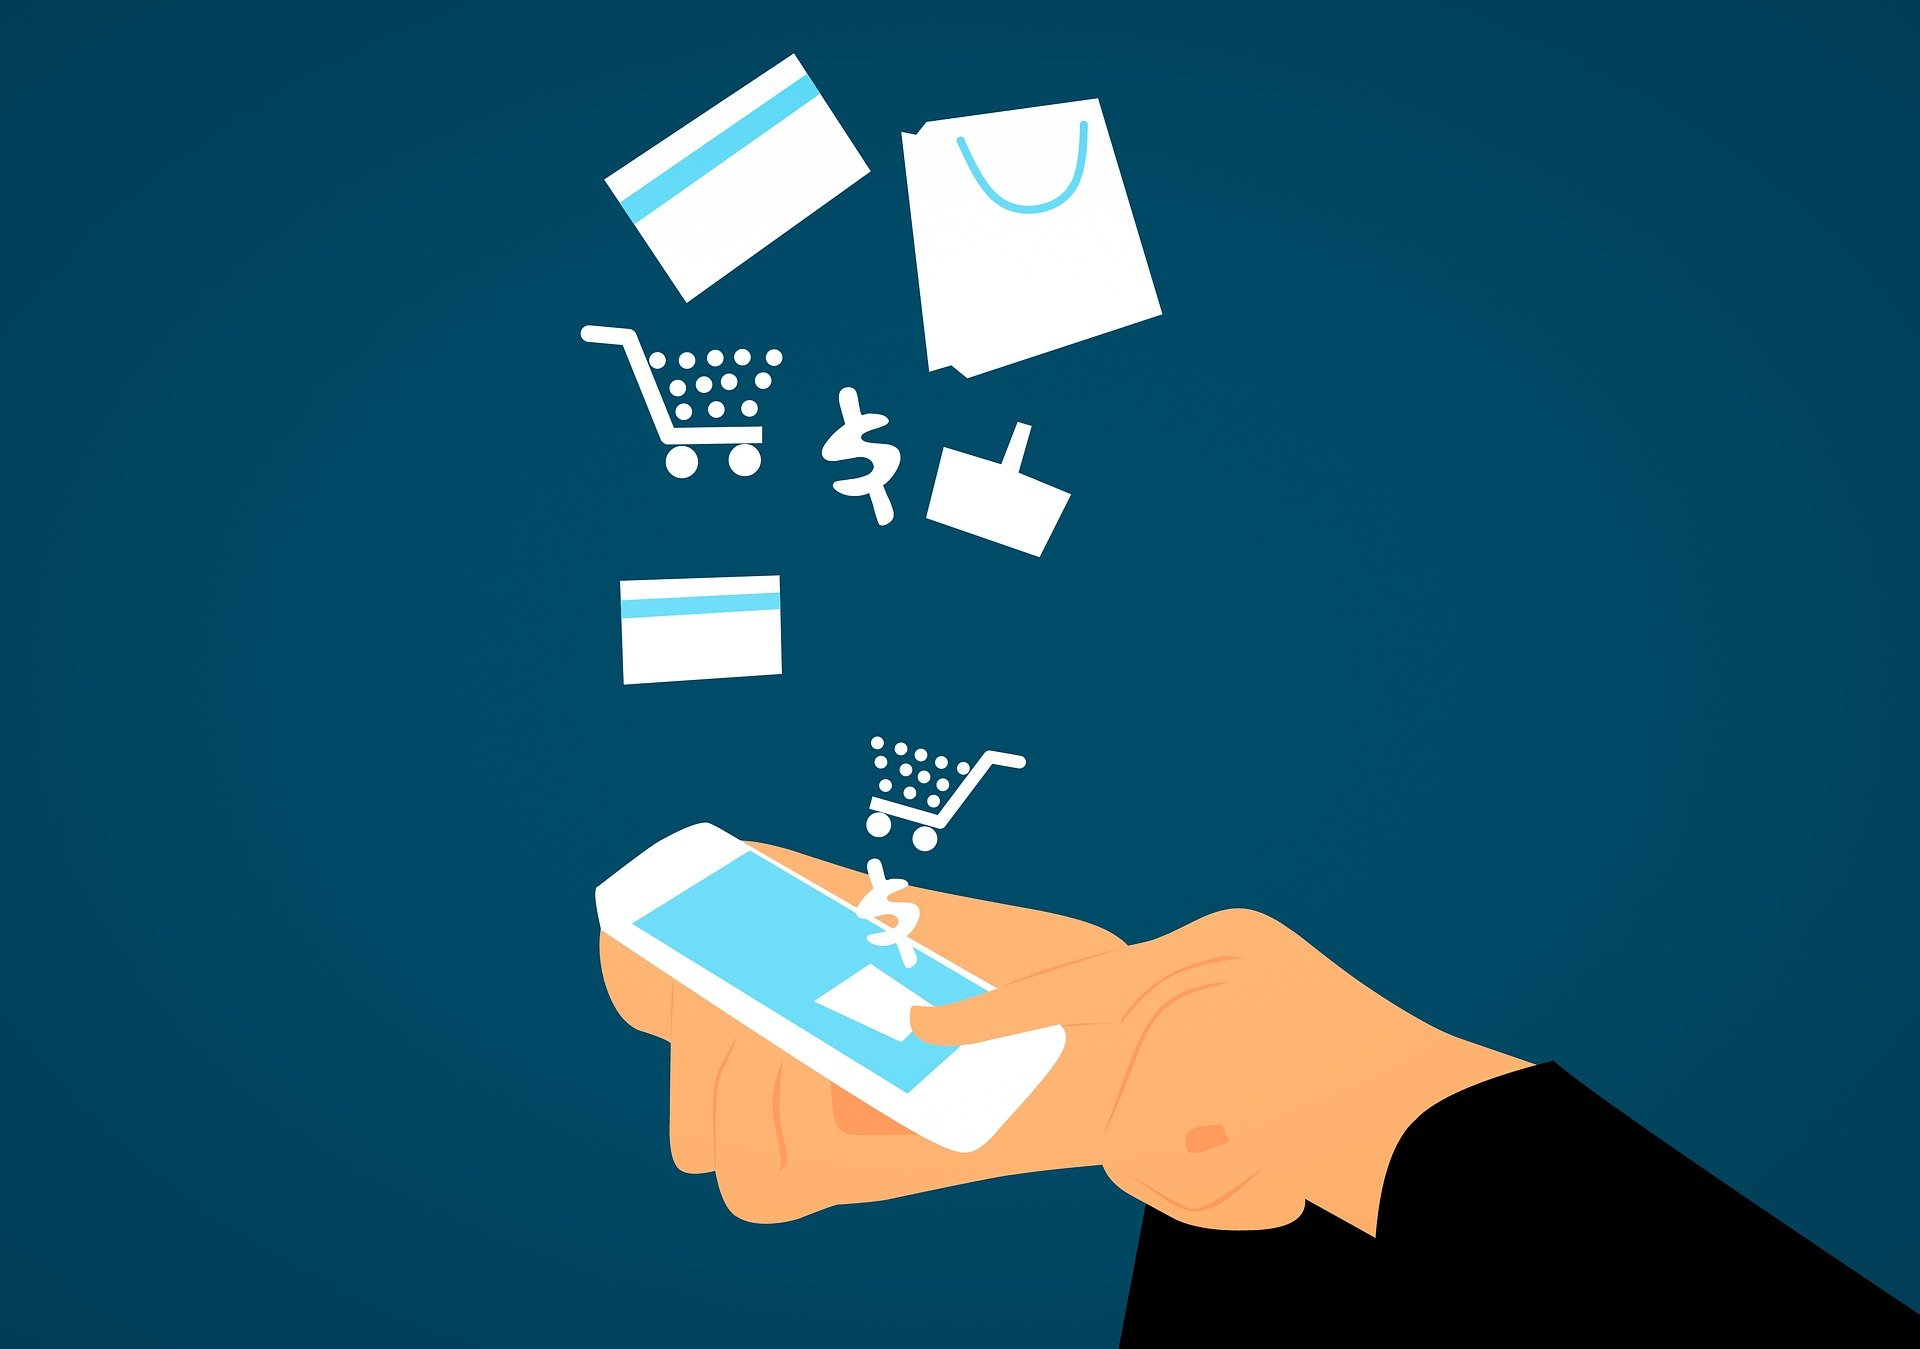 Apotheke Digitalisierung Social Media Erfolg